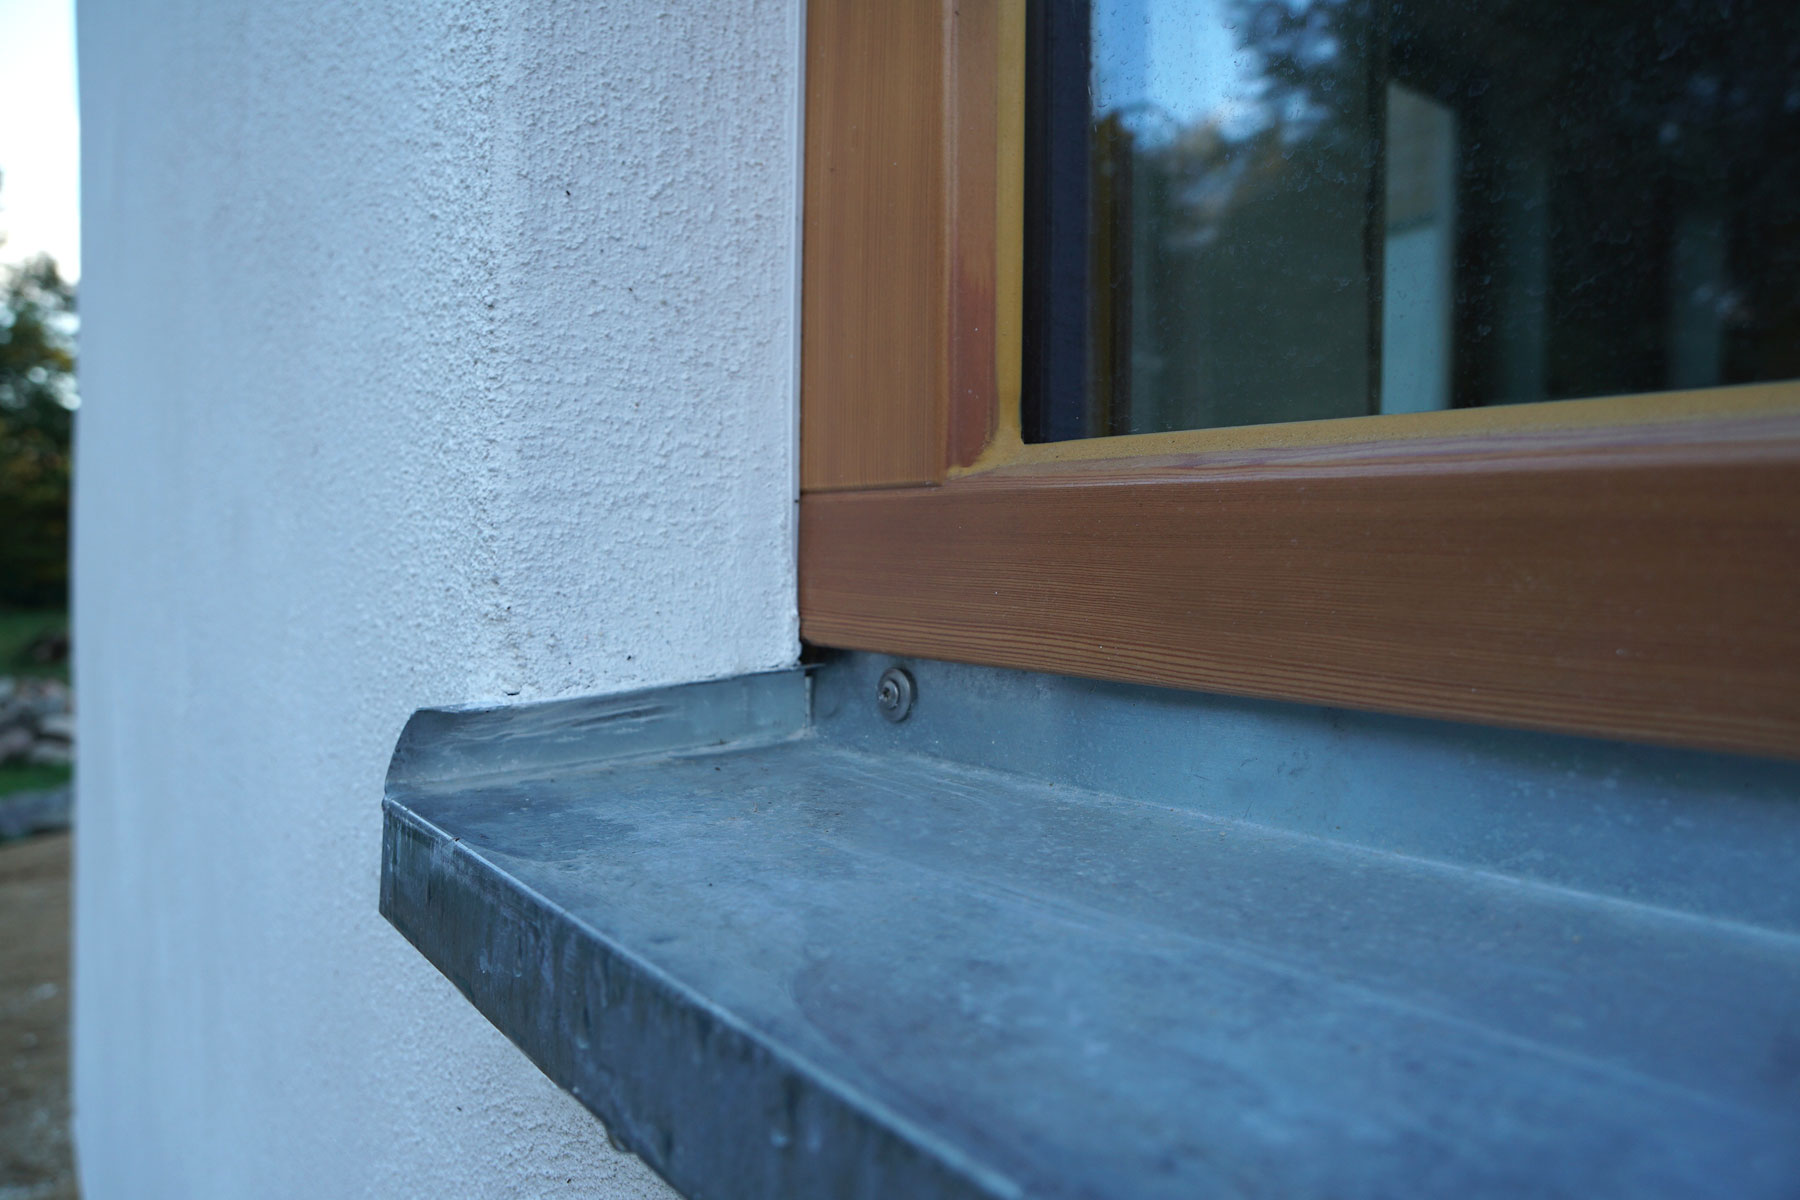 Holzrahmen Strohballen Kalkputz Fensterbank